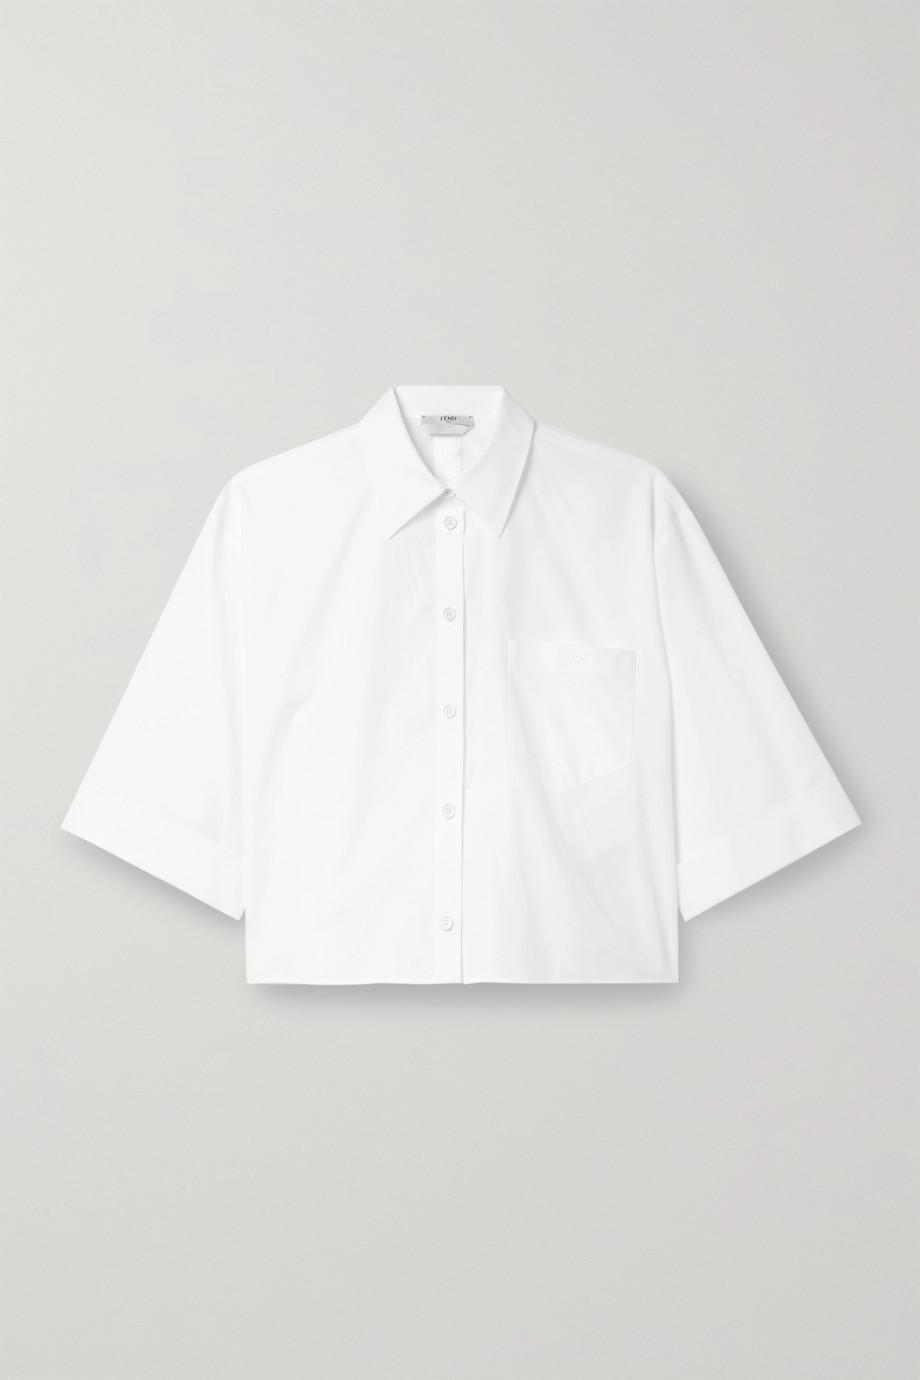 Fendi Verkürztes Hemd aus Baumwollpopeline